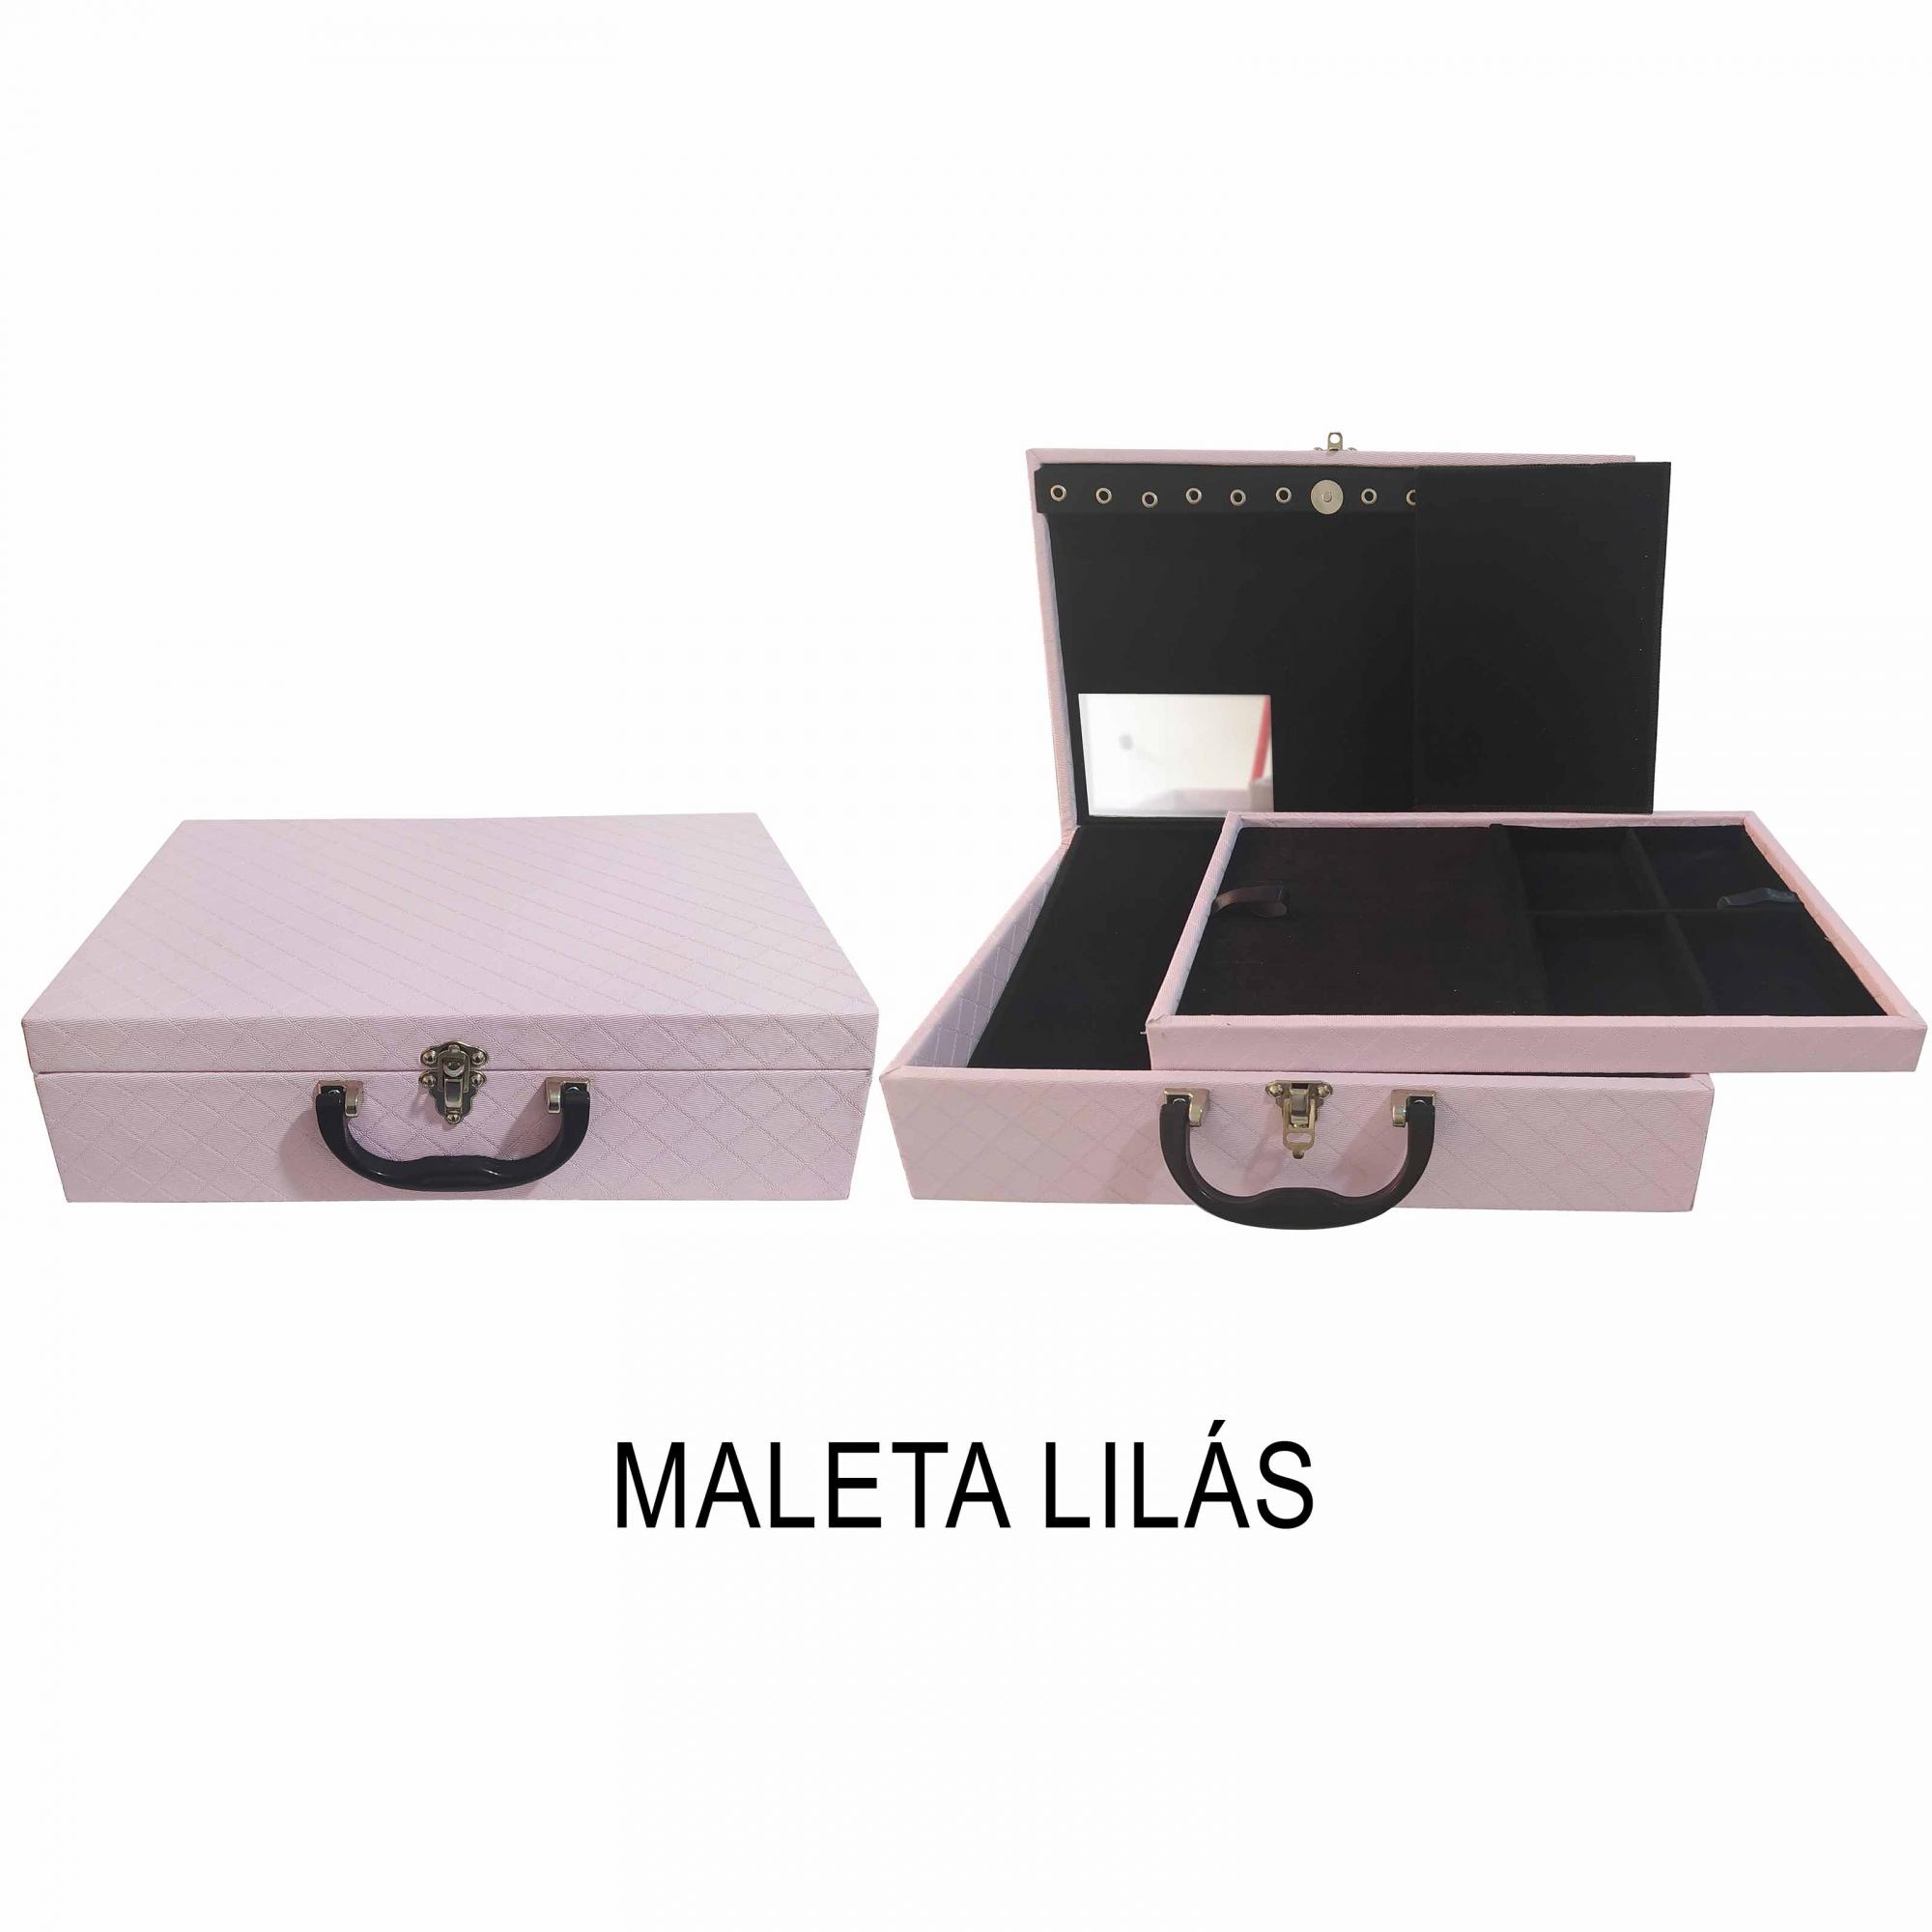 Maleta Vazia Texturizada Premium  - Lunozê Joias